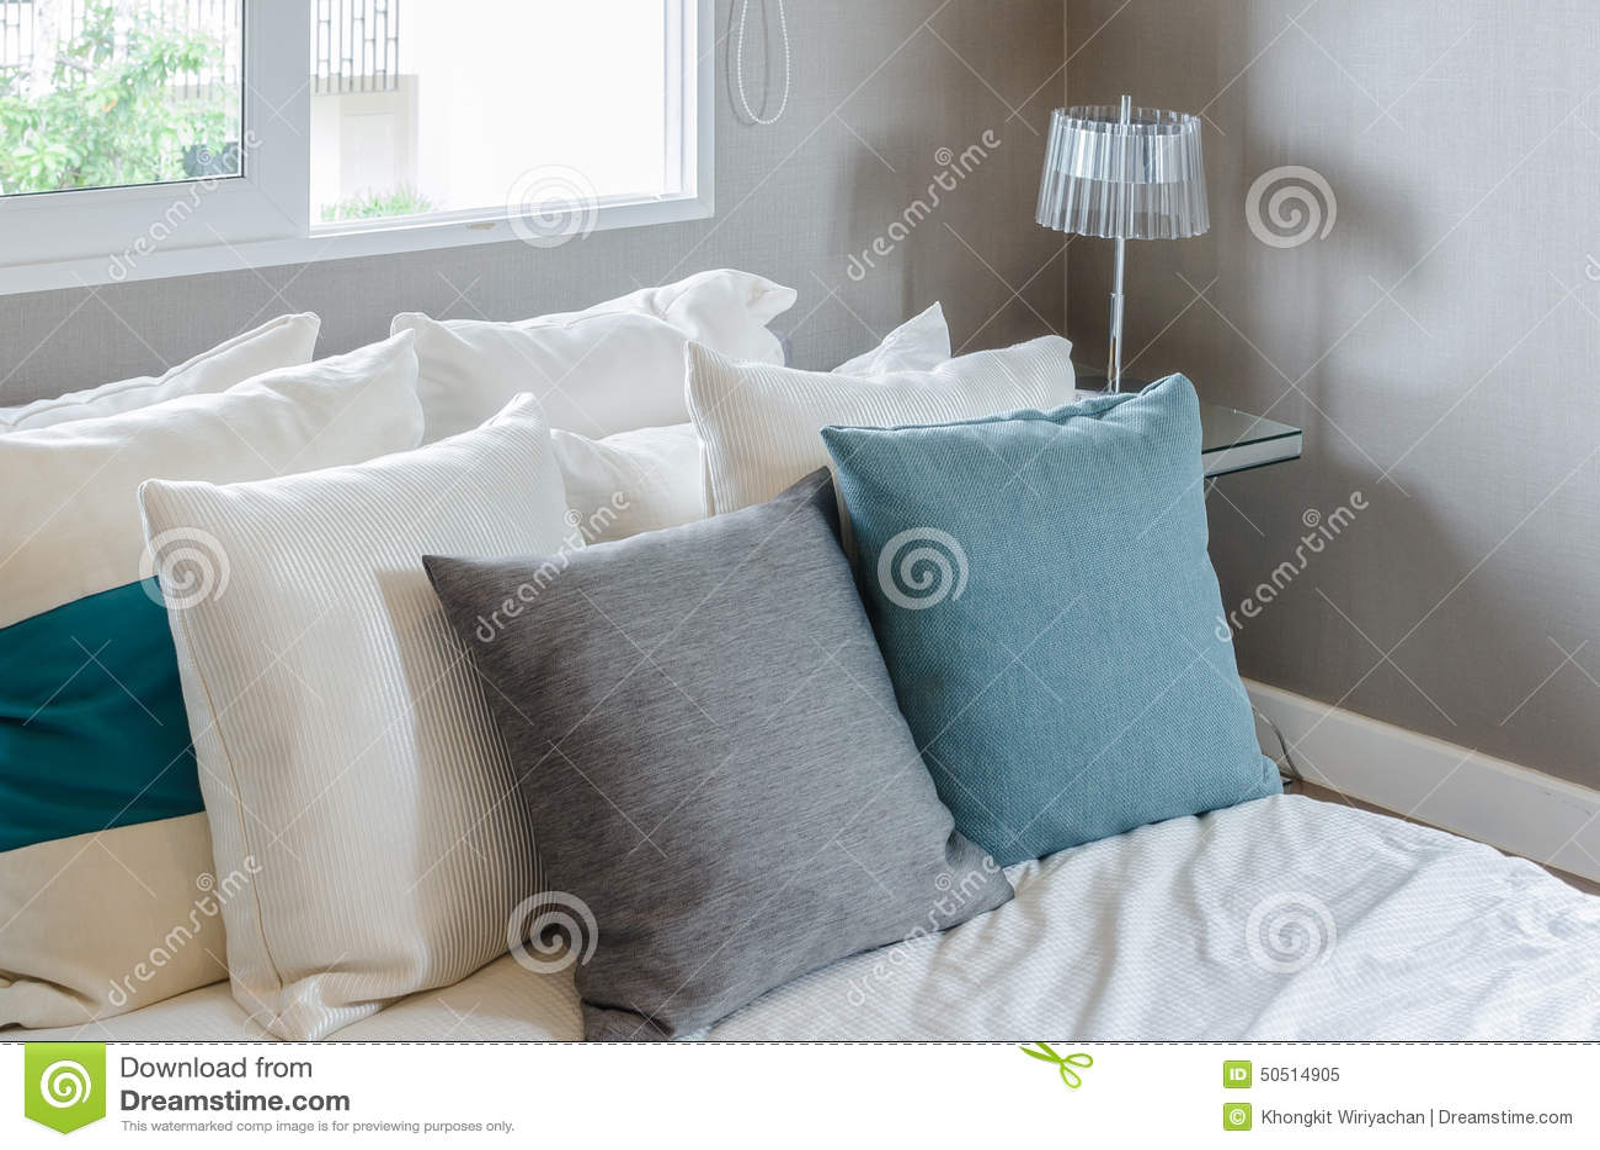 Slaapkamer Groen Wit : Grijs en groen hoofdkussen op wit bed in moderne slaapkamer stock